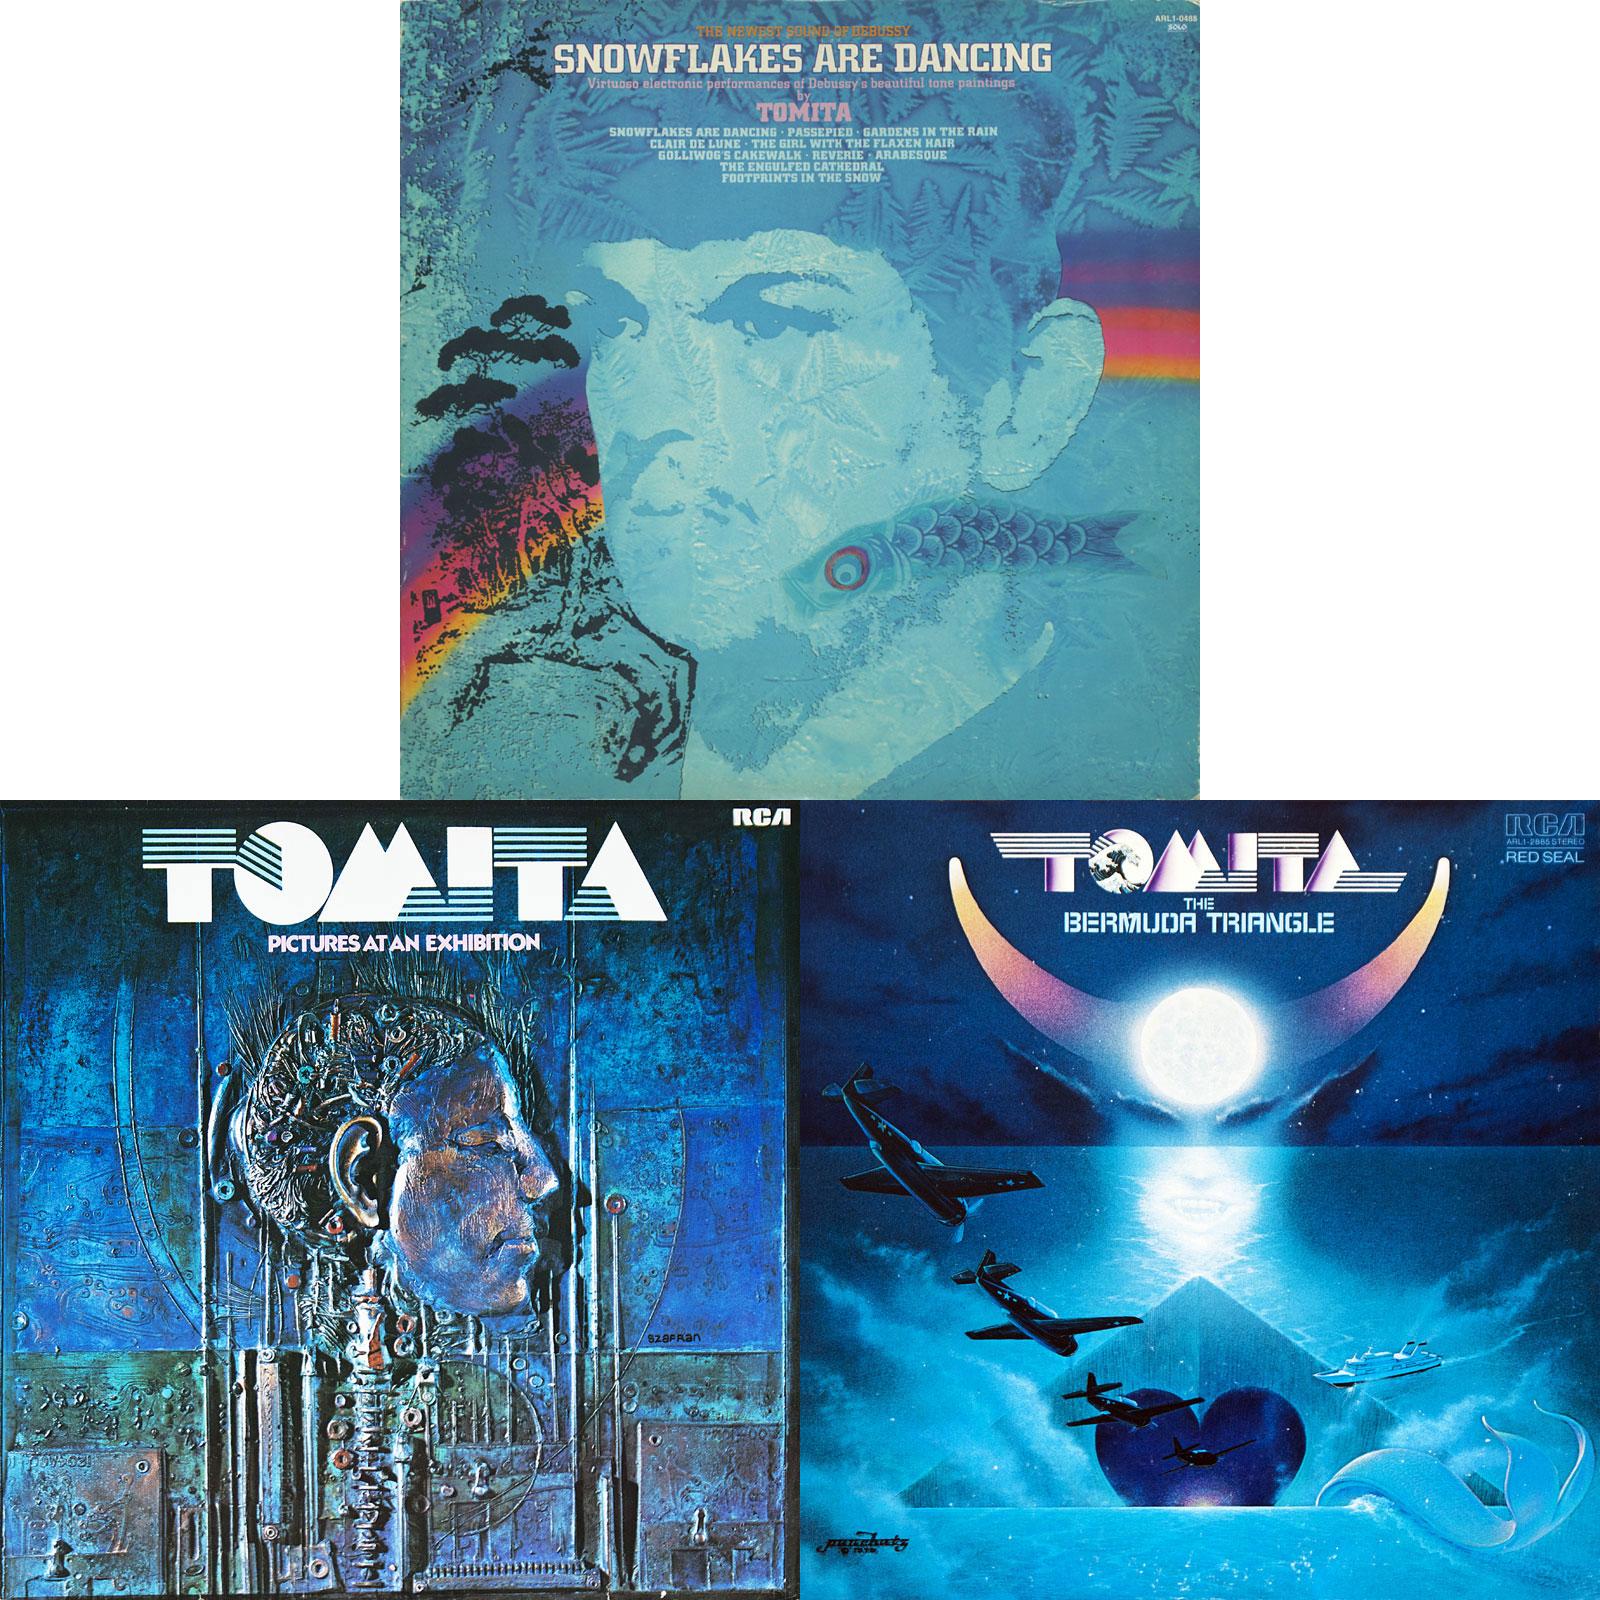 Isao Tomita: Collection (1974-1978) [3LP, Vinyl Rip 16/44 & mp3-320 + DVD]